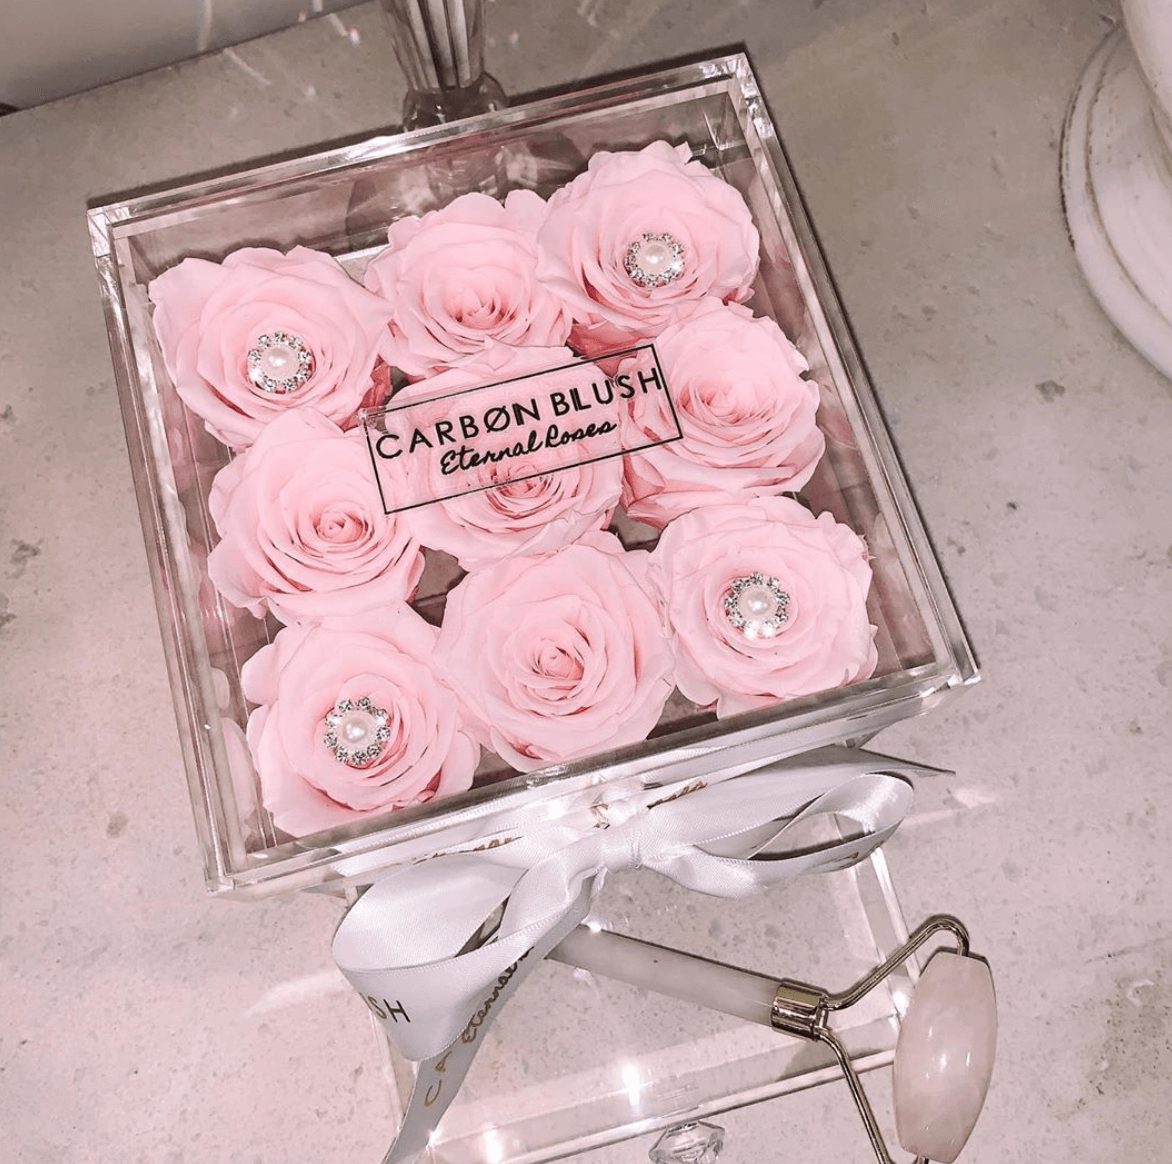 Carbon Blush Eternal Roses